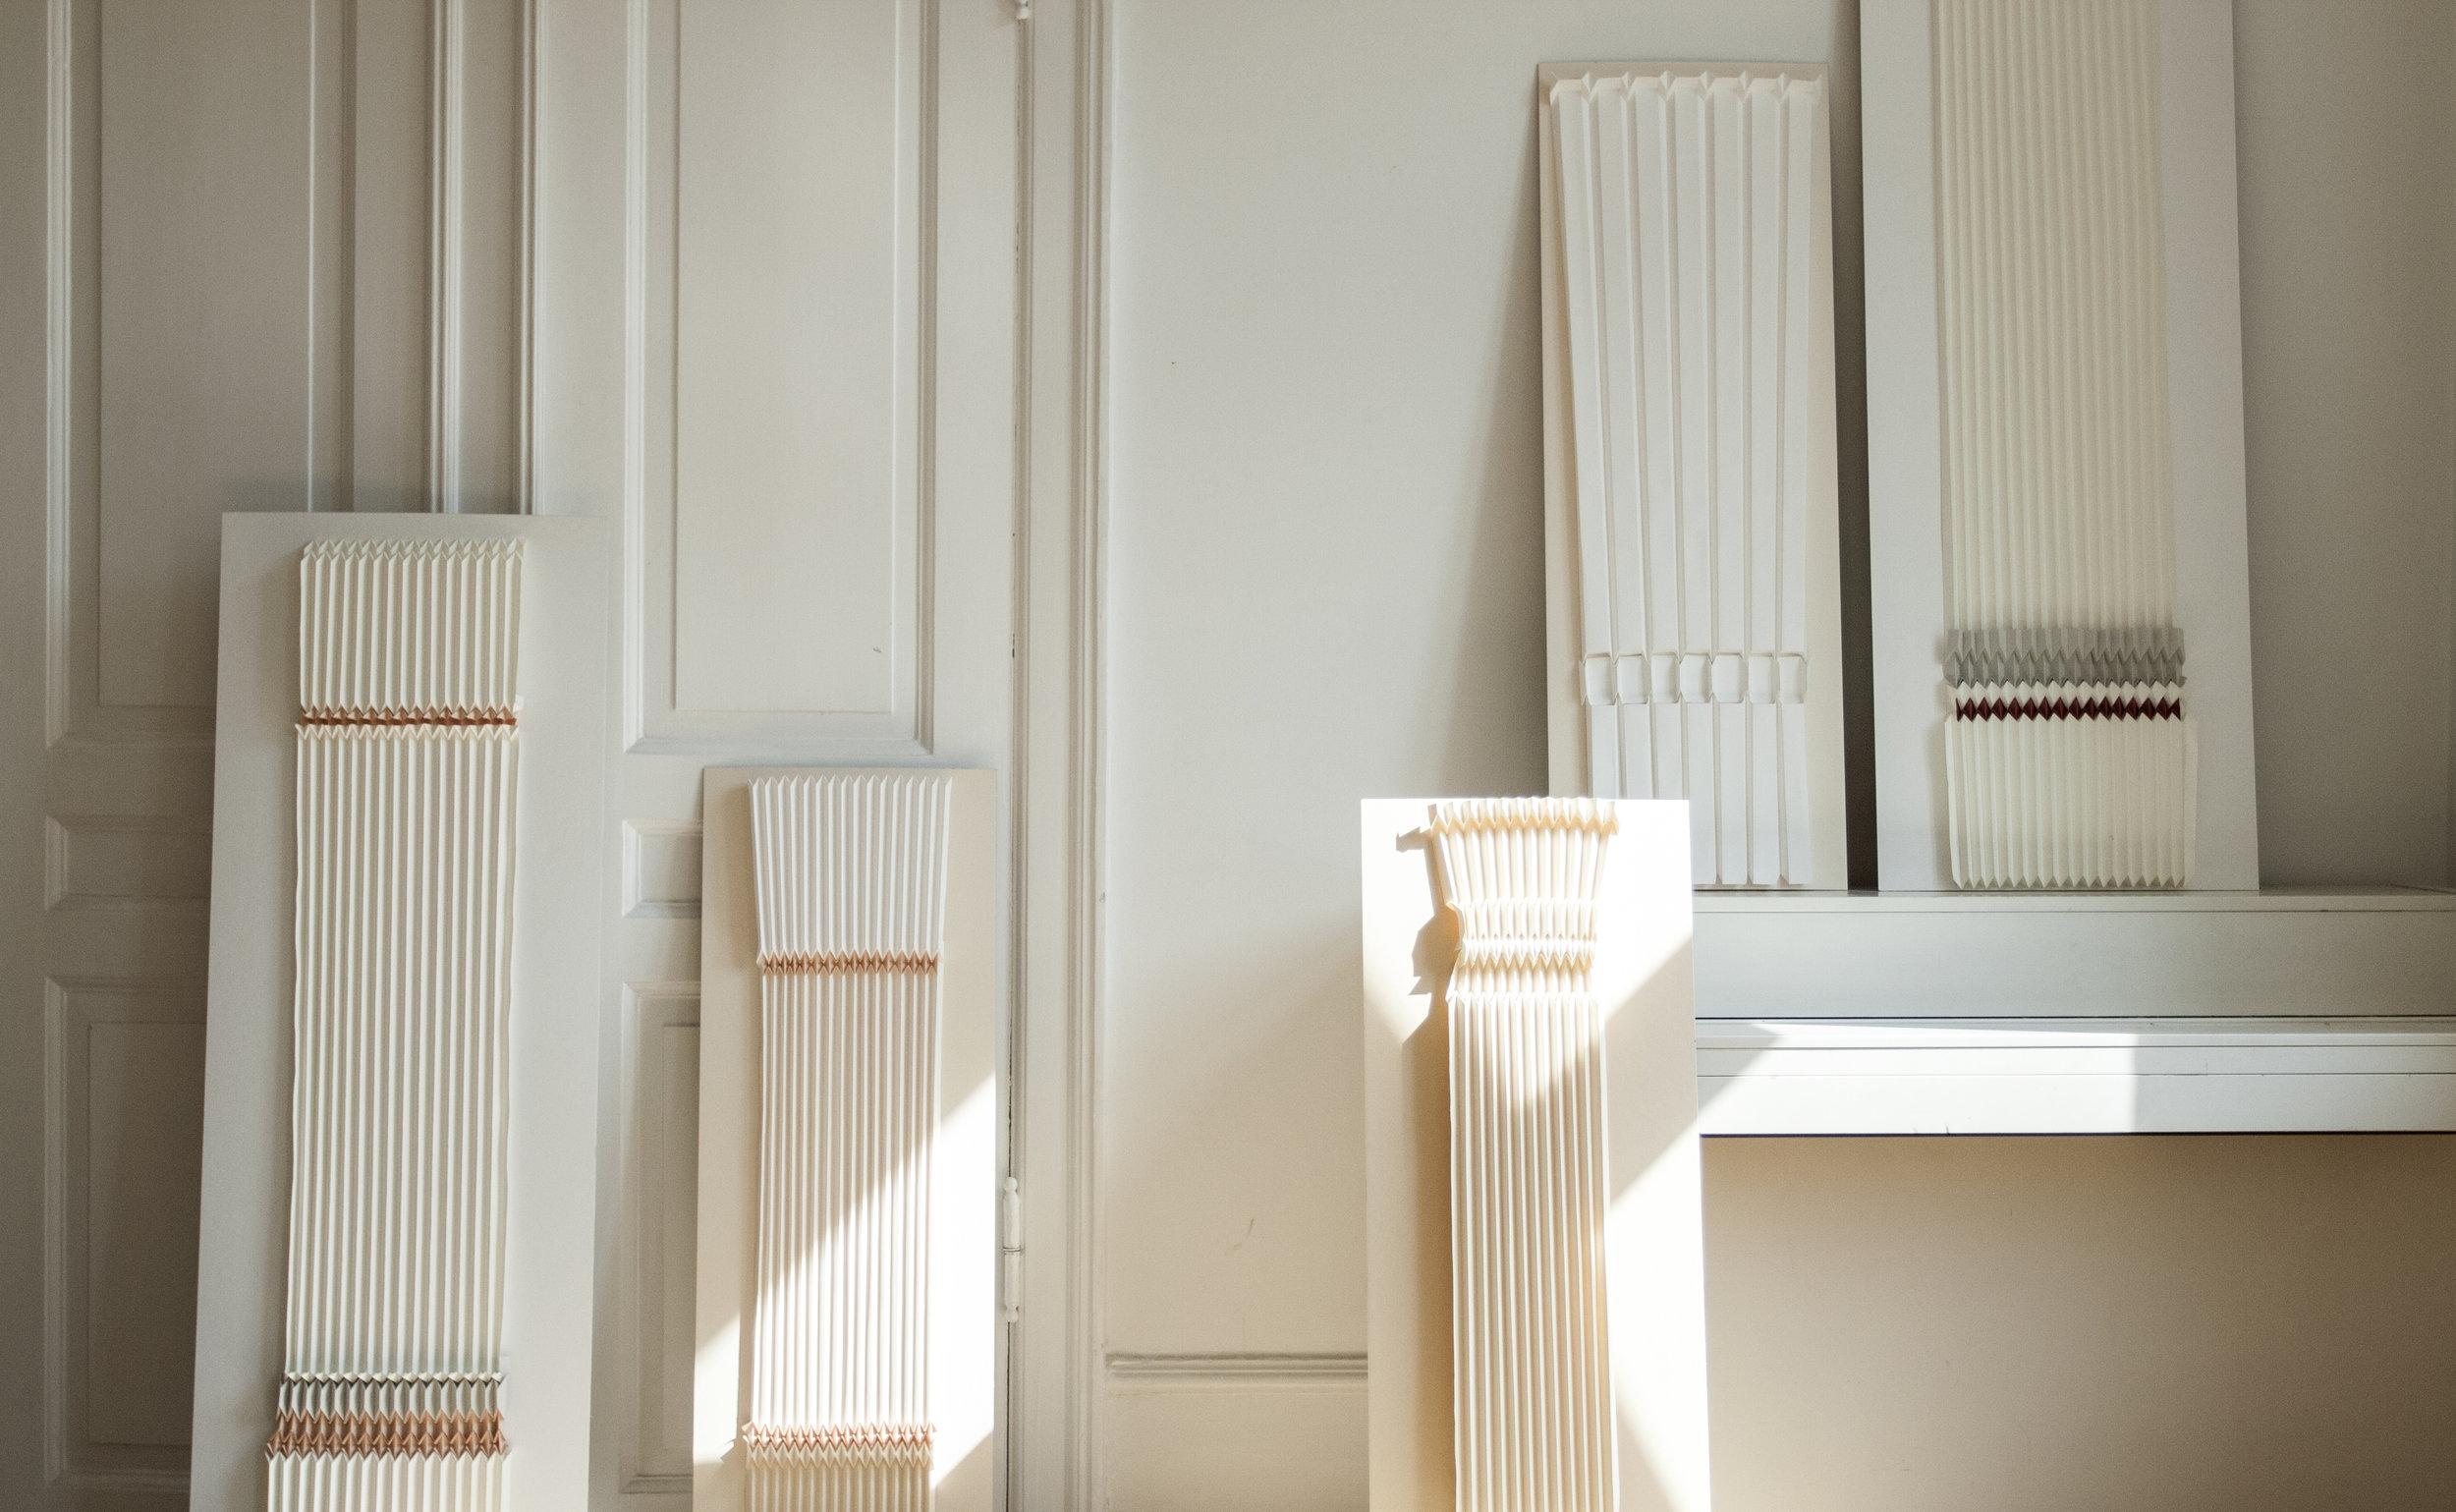 Doric Plissé - Paper creations inspired by Doric columns